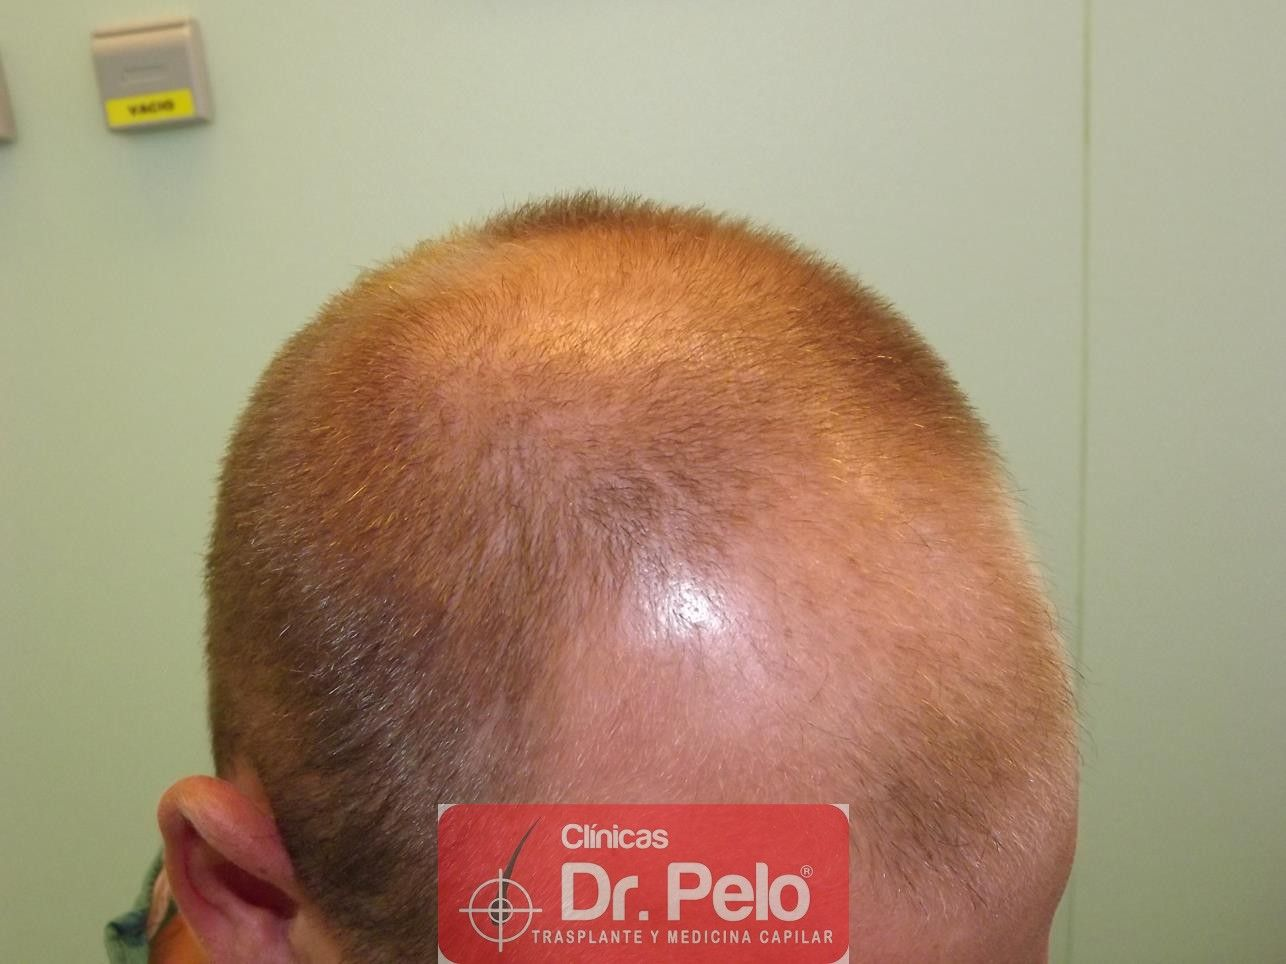 [Imagen: trasplante-pelo-fueDSCF8128-Copy.jpg]